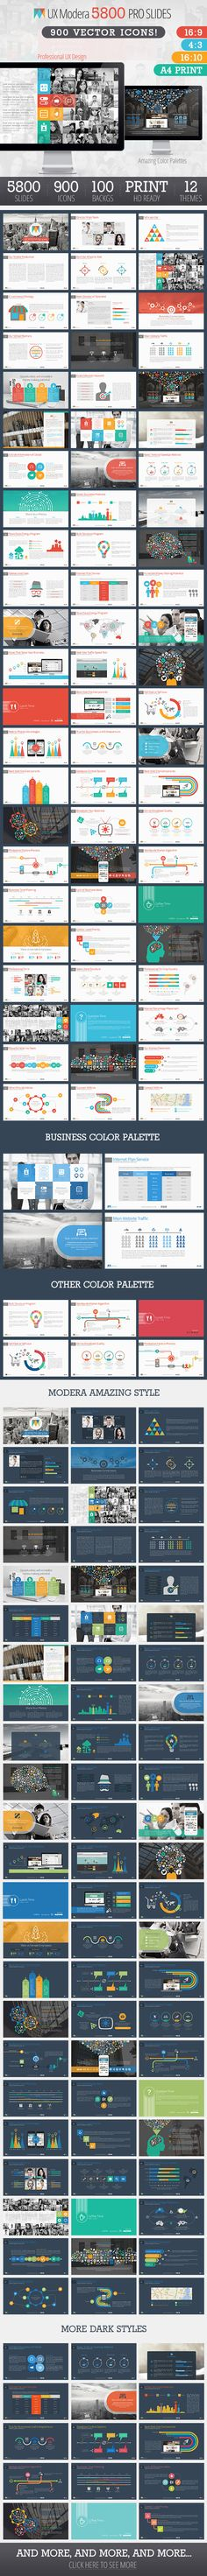 UX Modera Presentation Template PowerPoint Template / Theme / Presentation / Slides / Background / Power Point #powerpoint #template #theme